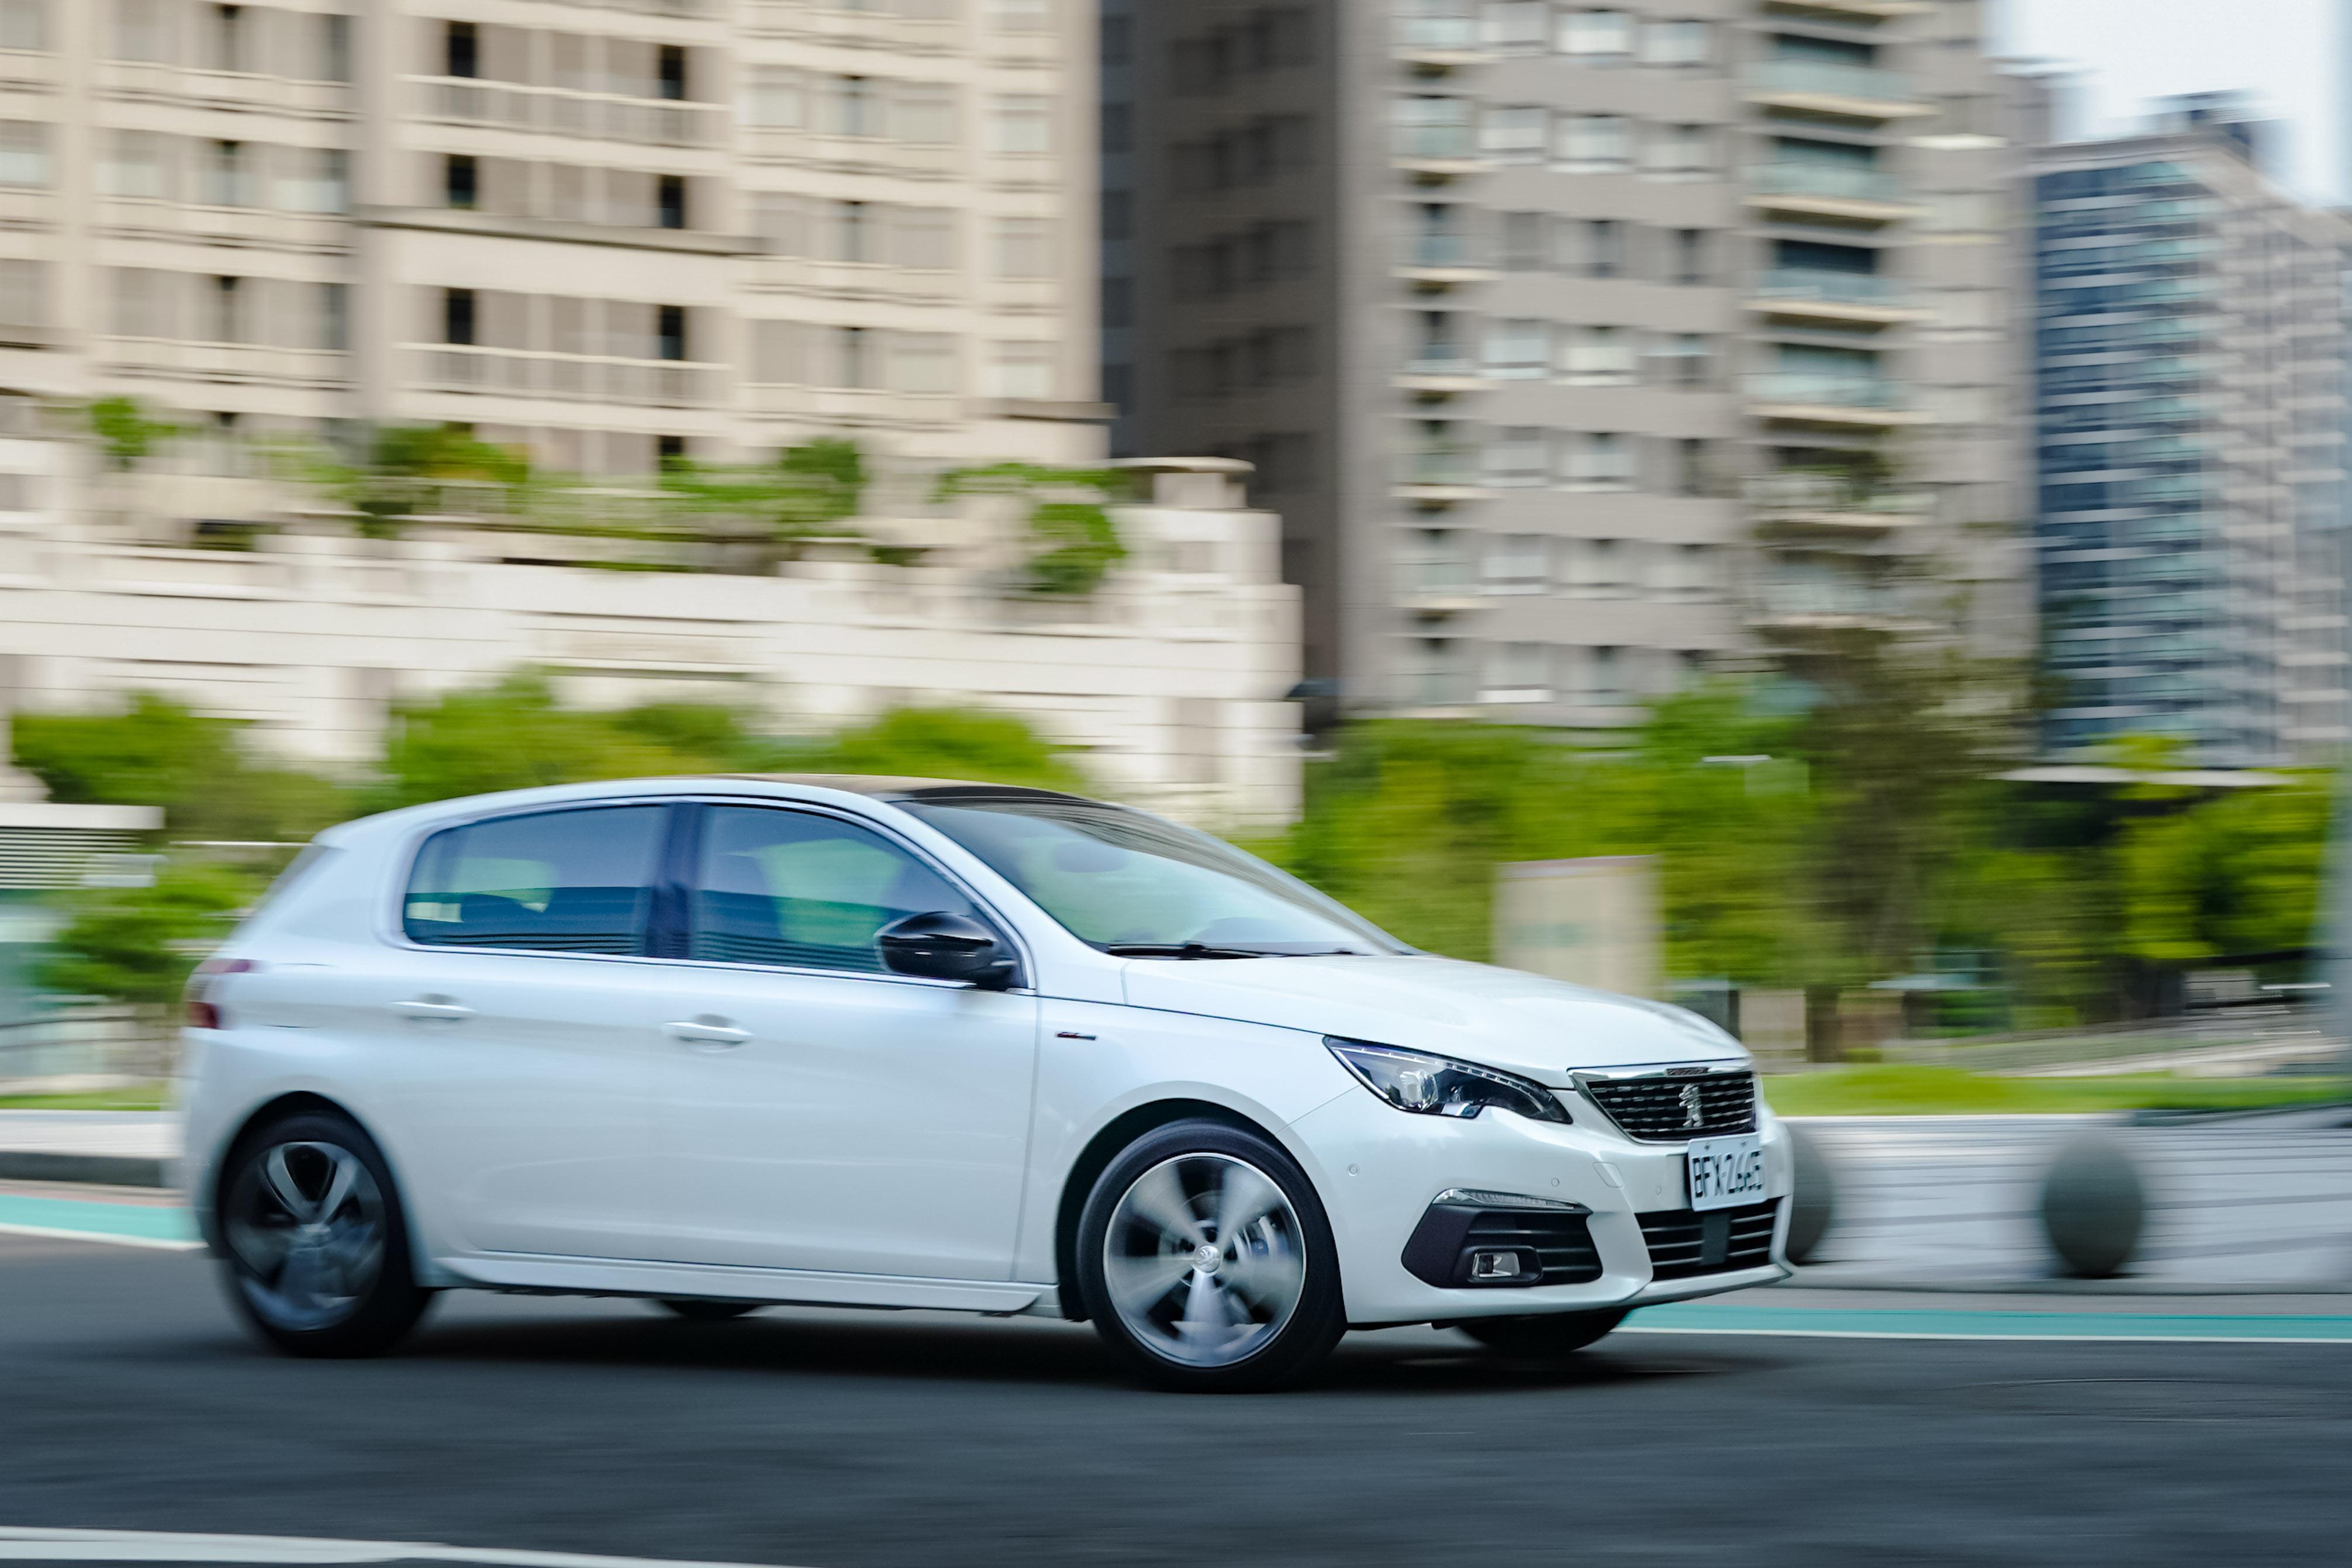 Peugeot 308 的底盤與操控設定是舒適與樂趣的理想平衡。